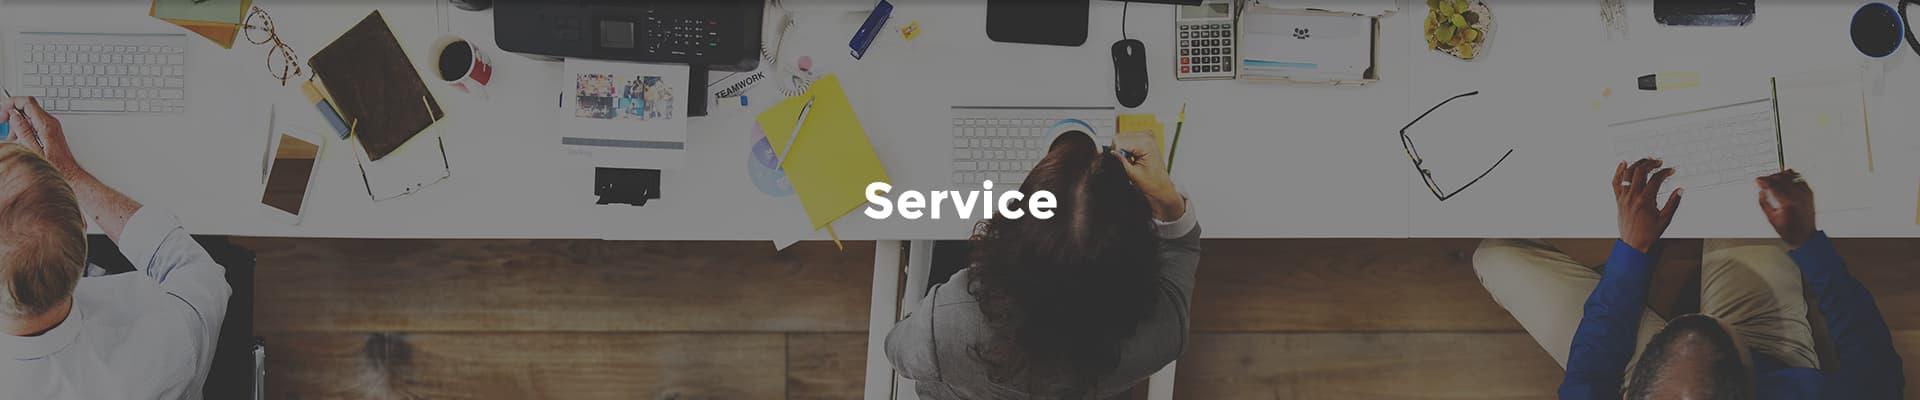 5-Service_02